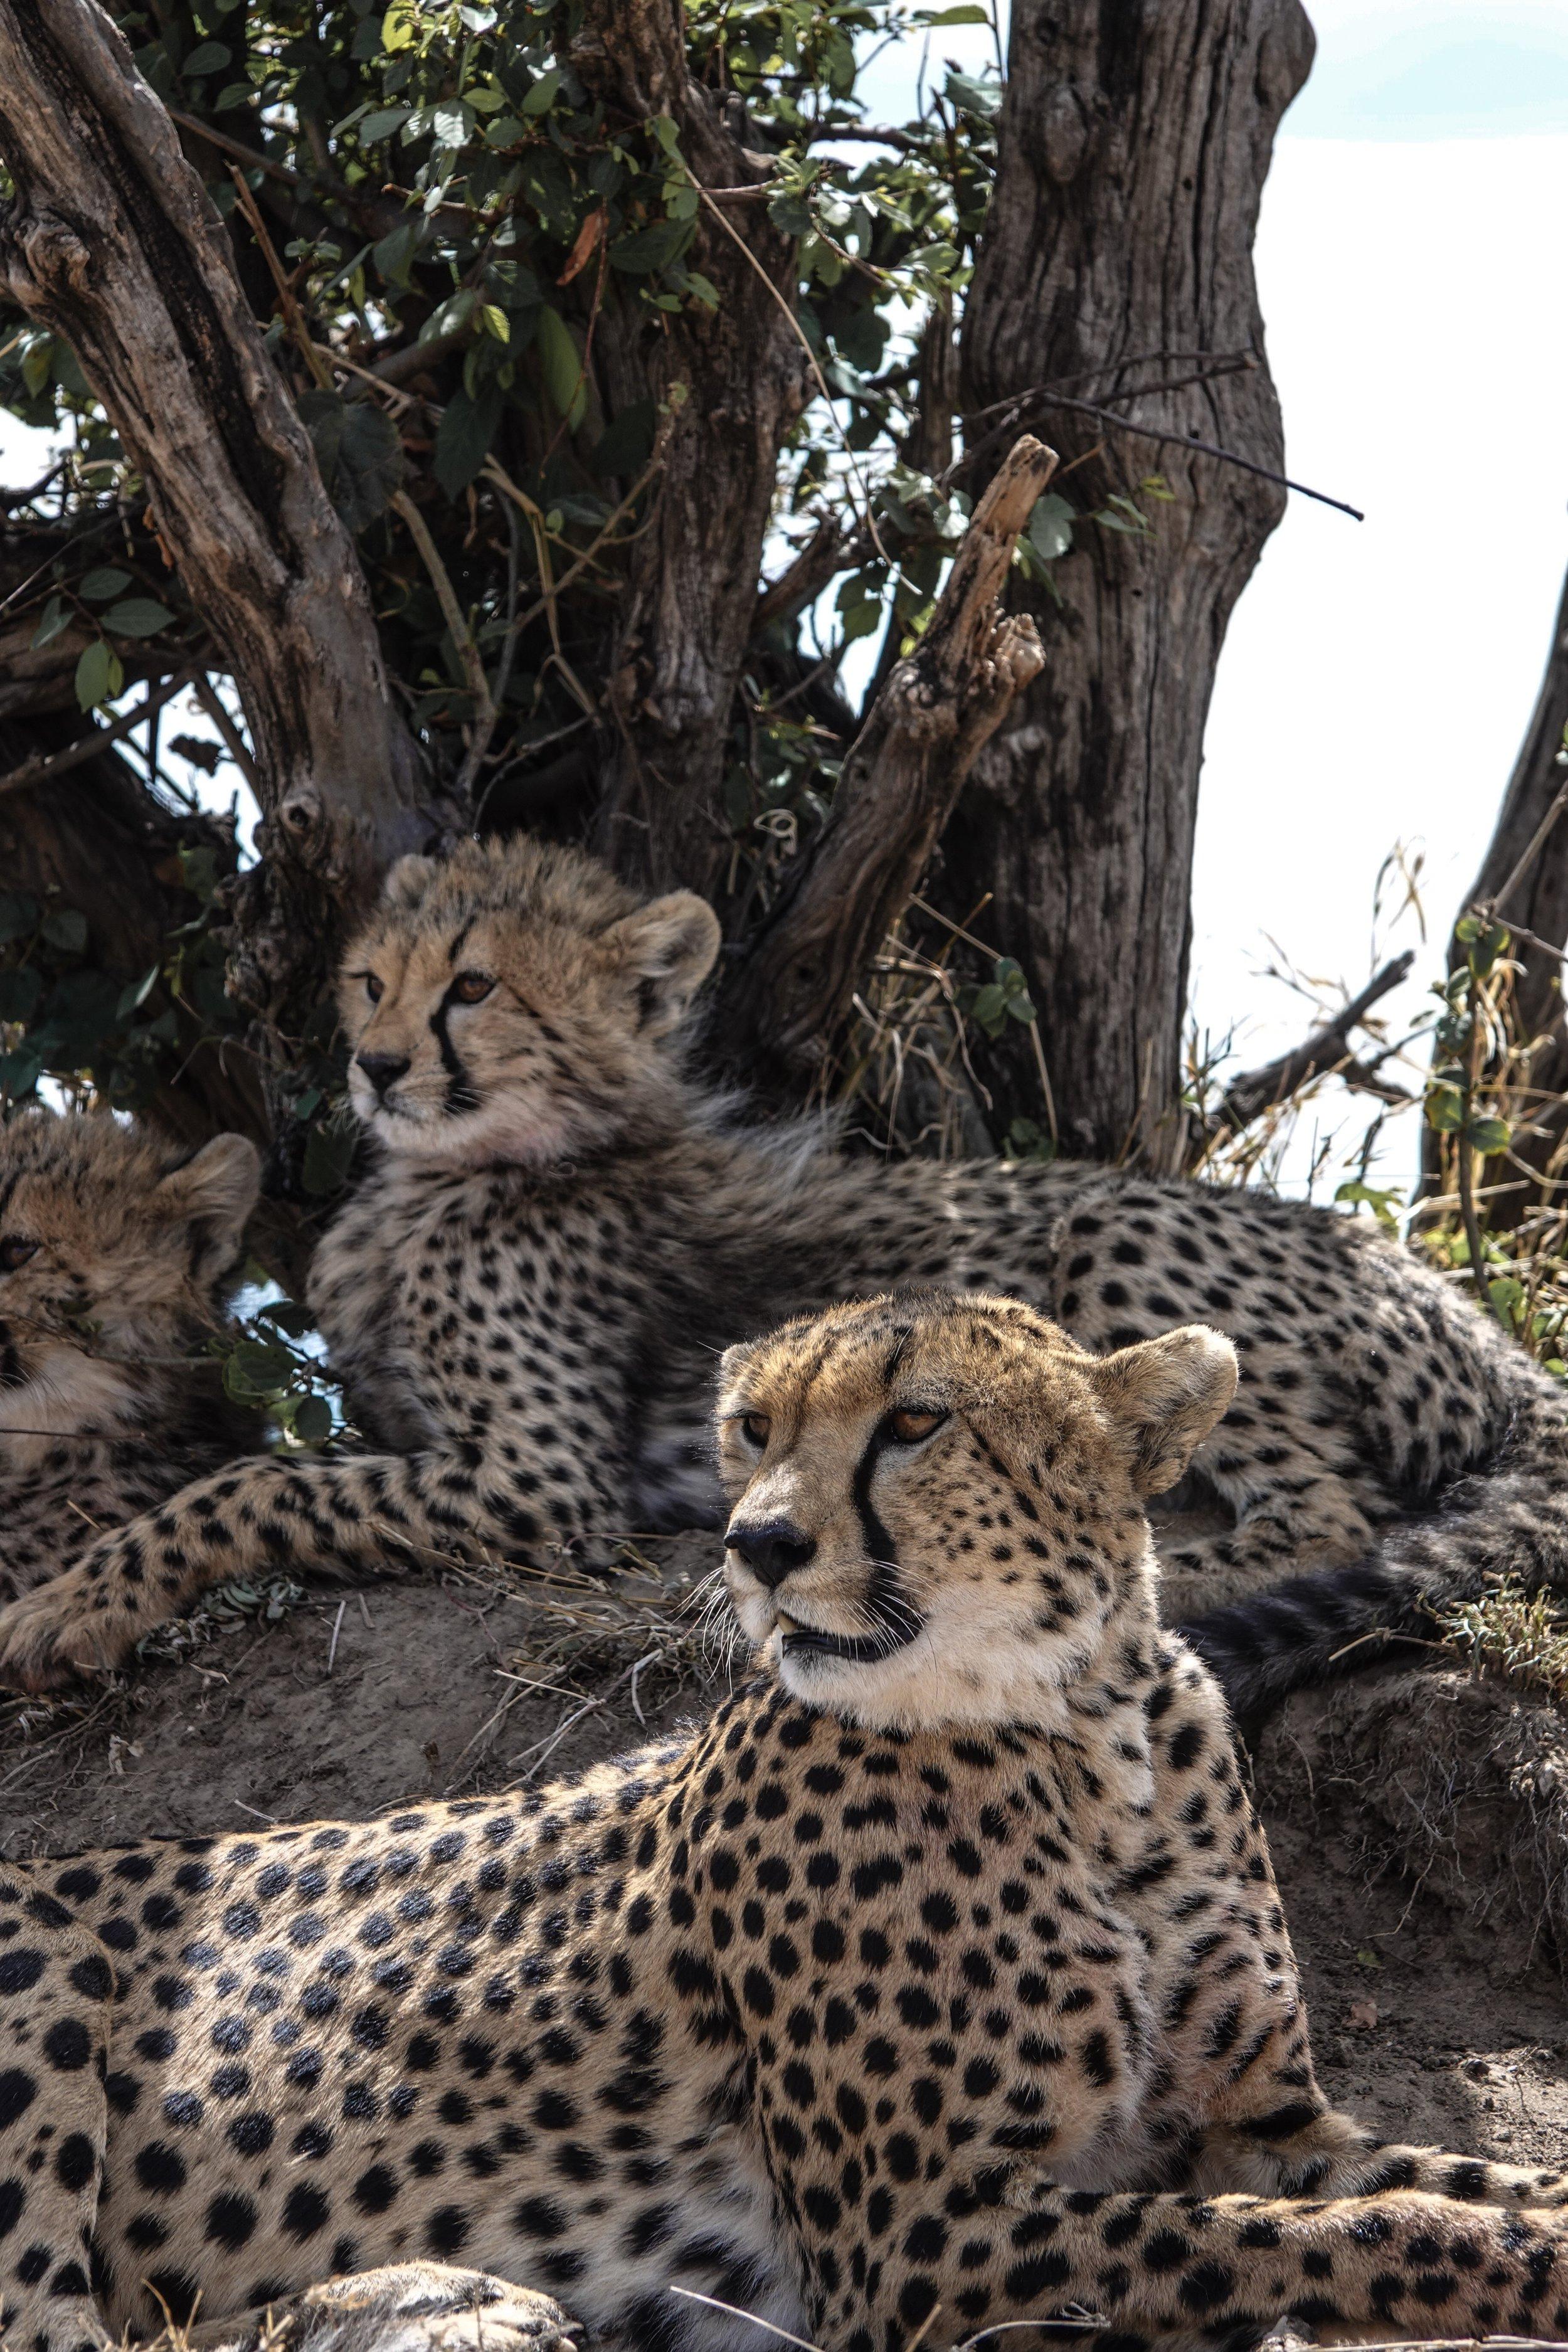 Cheetah + Cubs in Kenya, Africa Ph. Ashley Torres